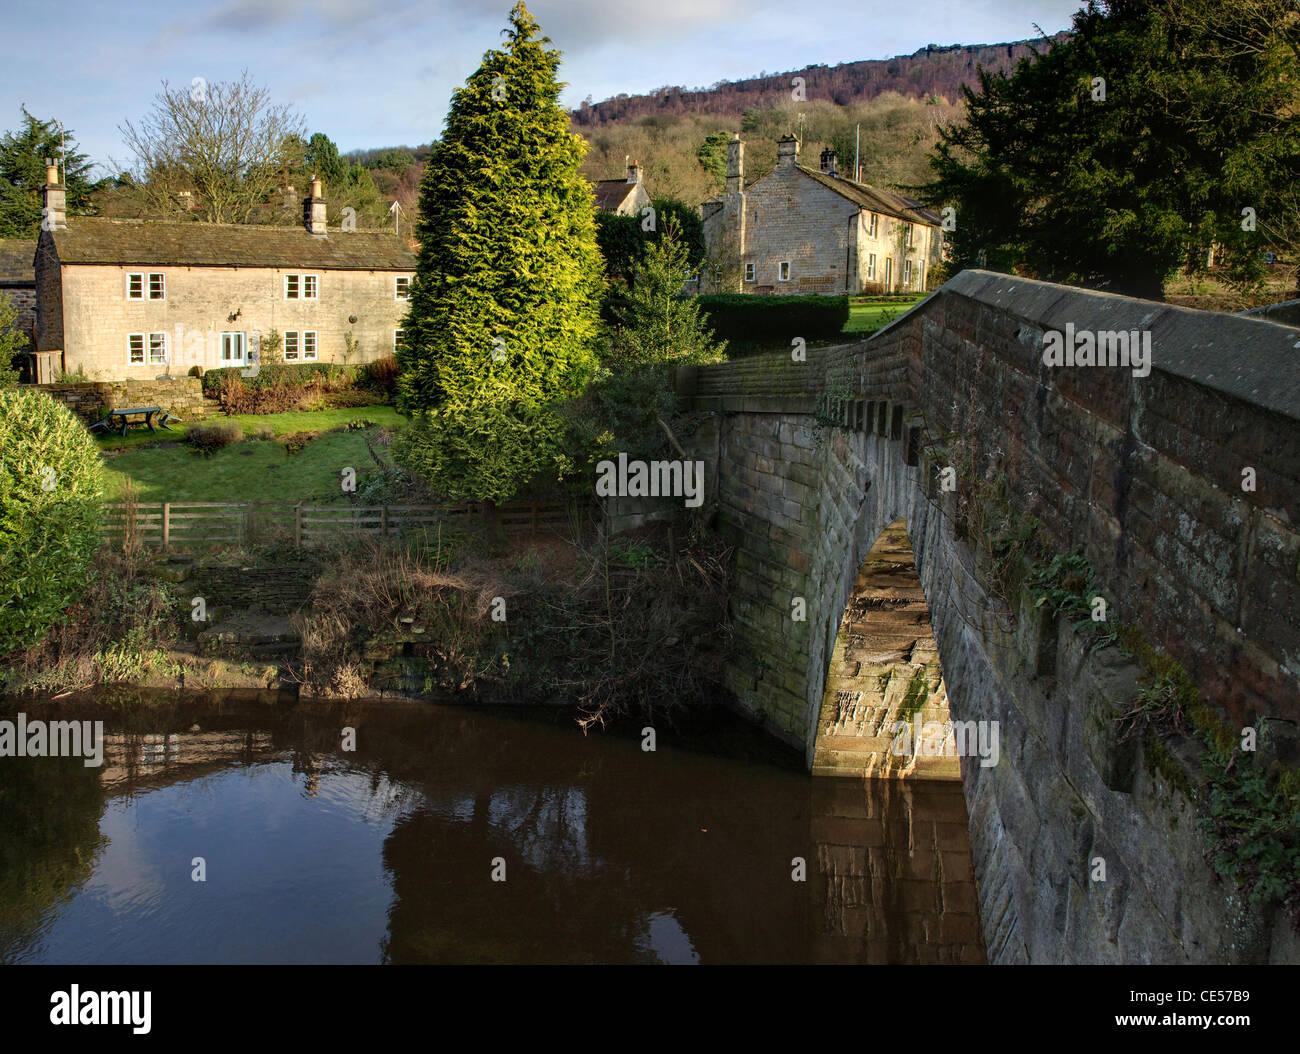 Froggatt Bridge is a stone structure spanning the river Derwent at the village of Froggatt in the Derbyshire Peak - Stock Image